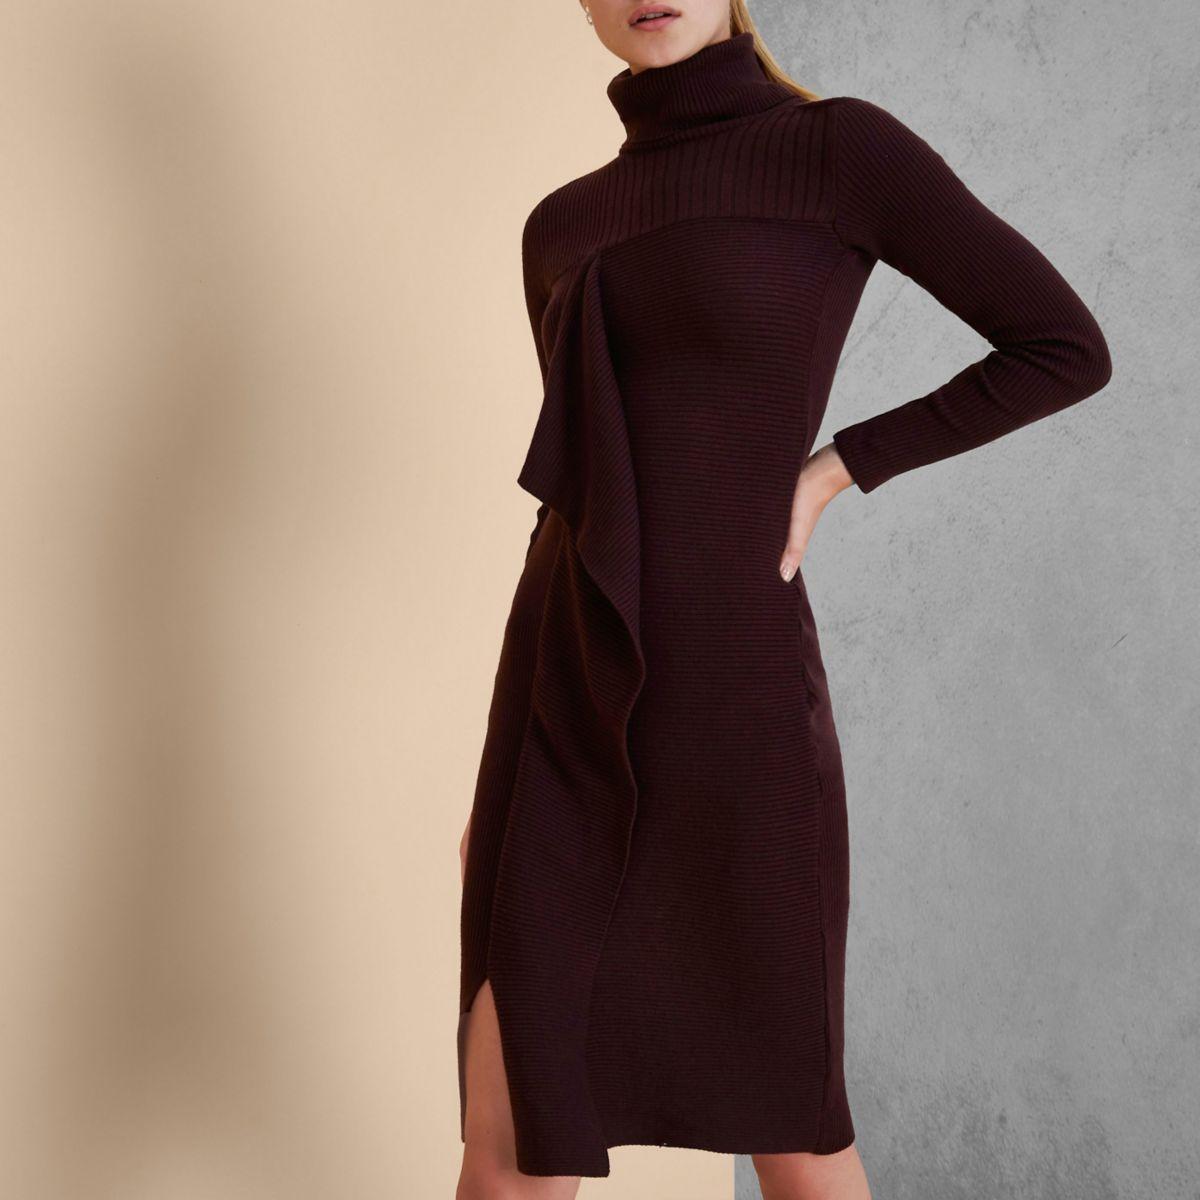 Burgundy Ri Studio Knit Rib Roll Neck Dress by River Island